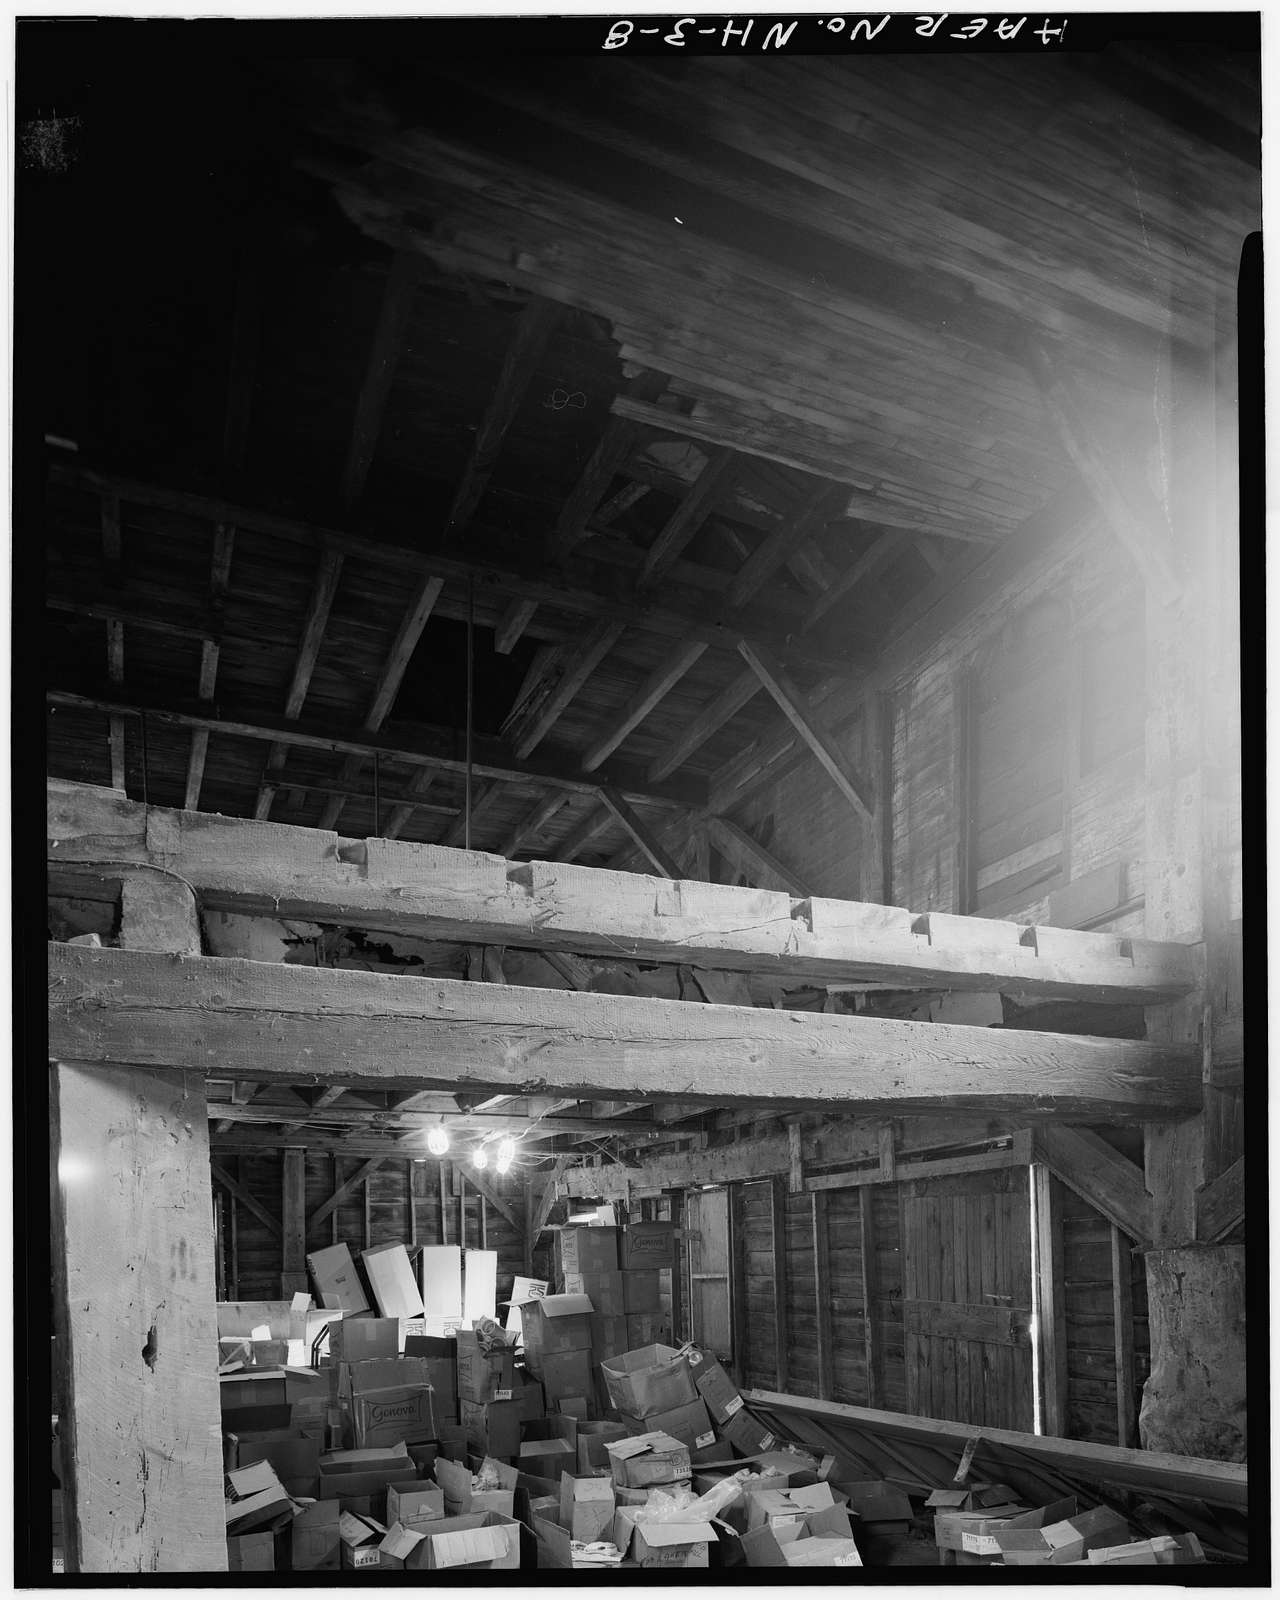 Sugar River Grist Mill & Saw Mill, 159 Main Street, Claremont, Sullivan County, NH